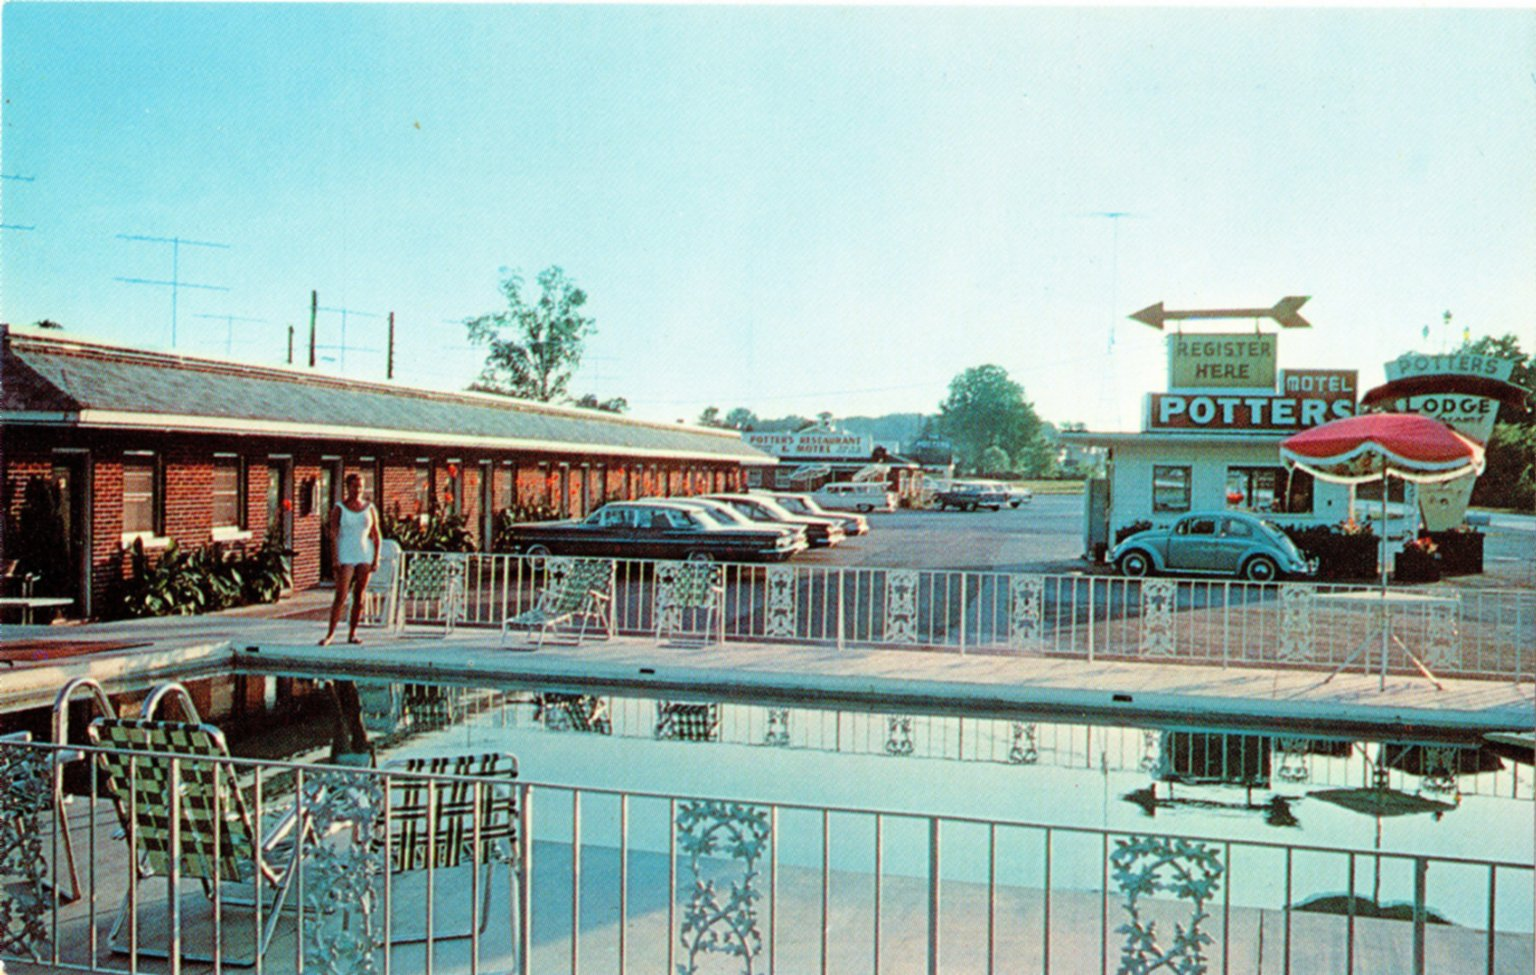 Potter's Motel and Restaurant